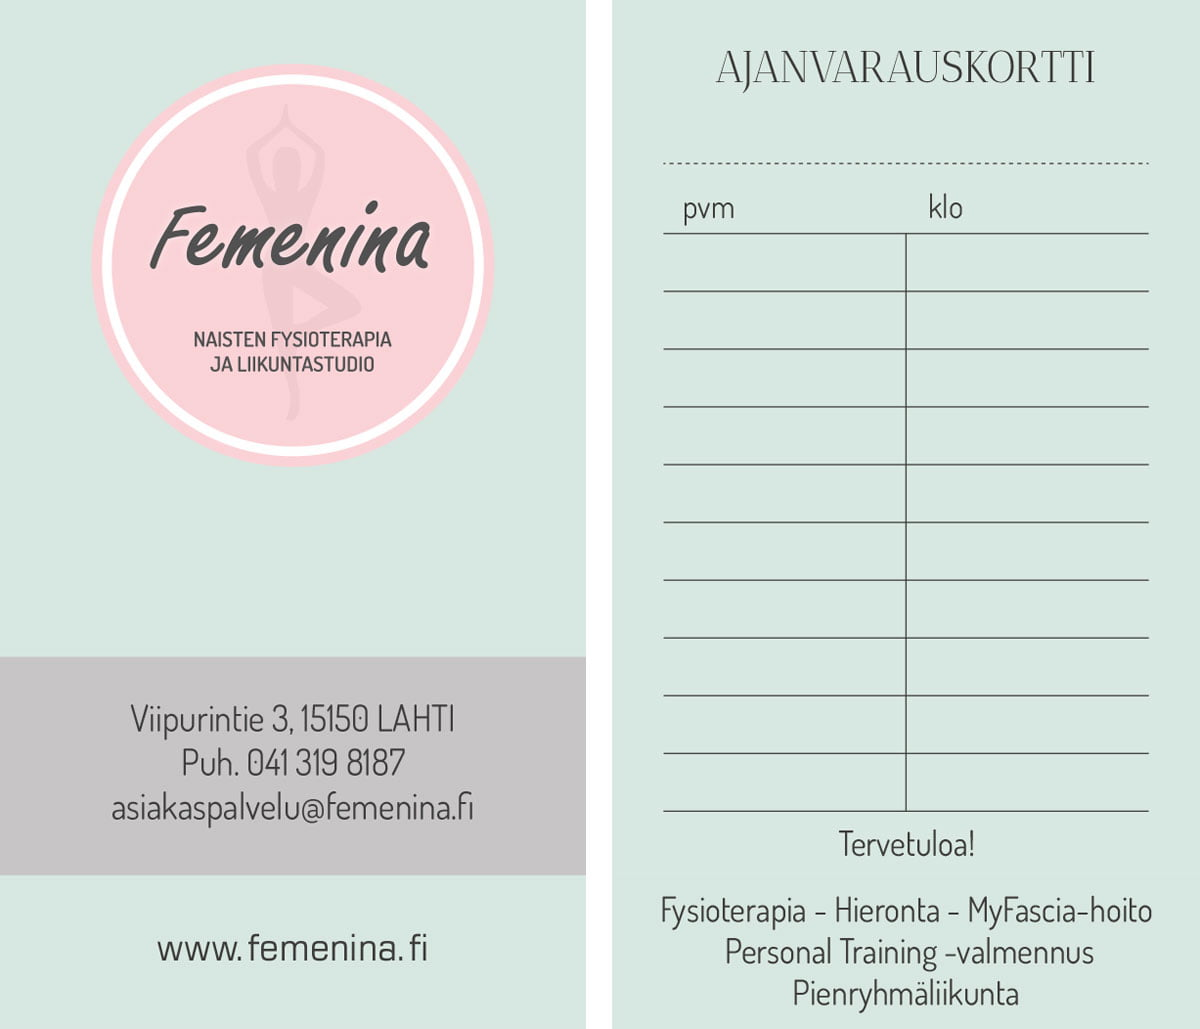 femenina-ajanvarausikortti